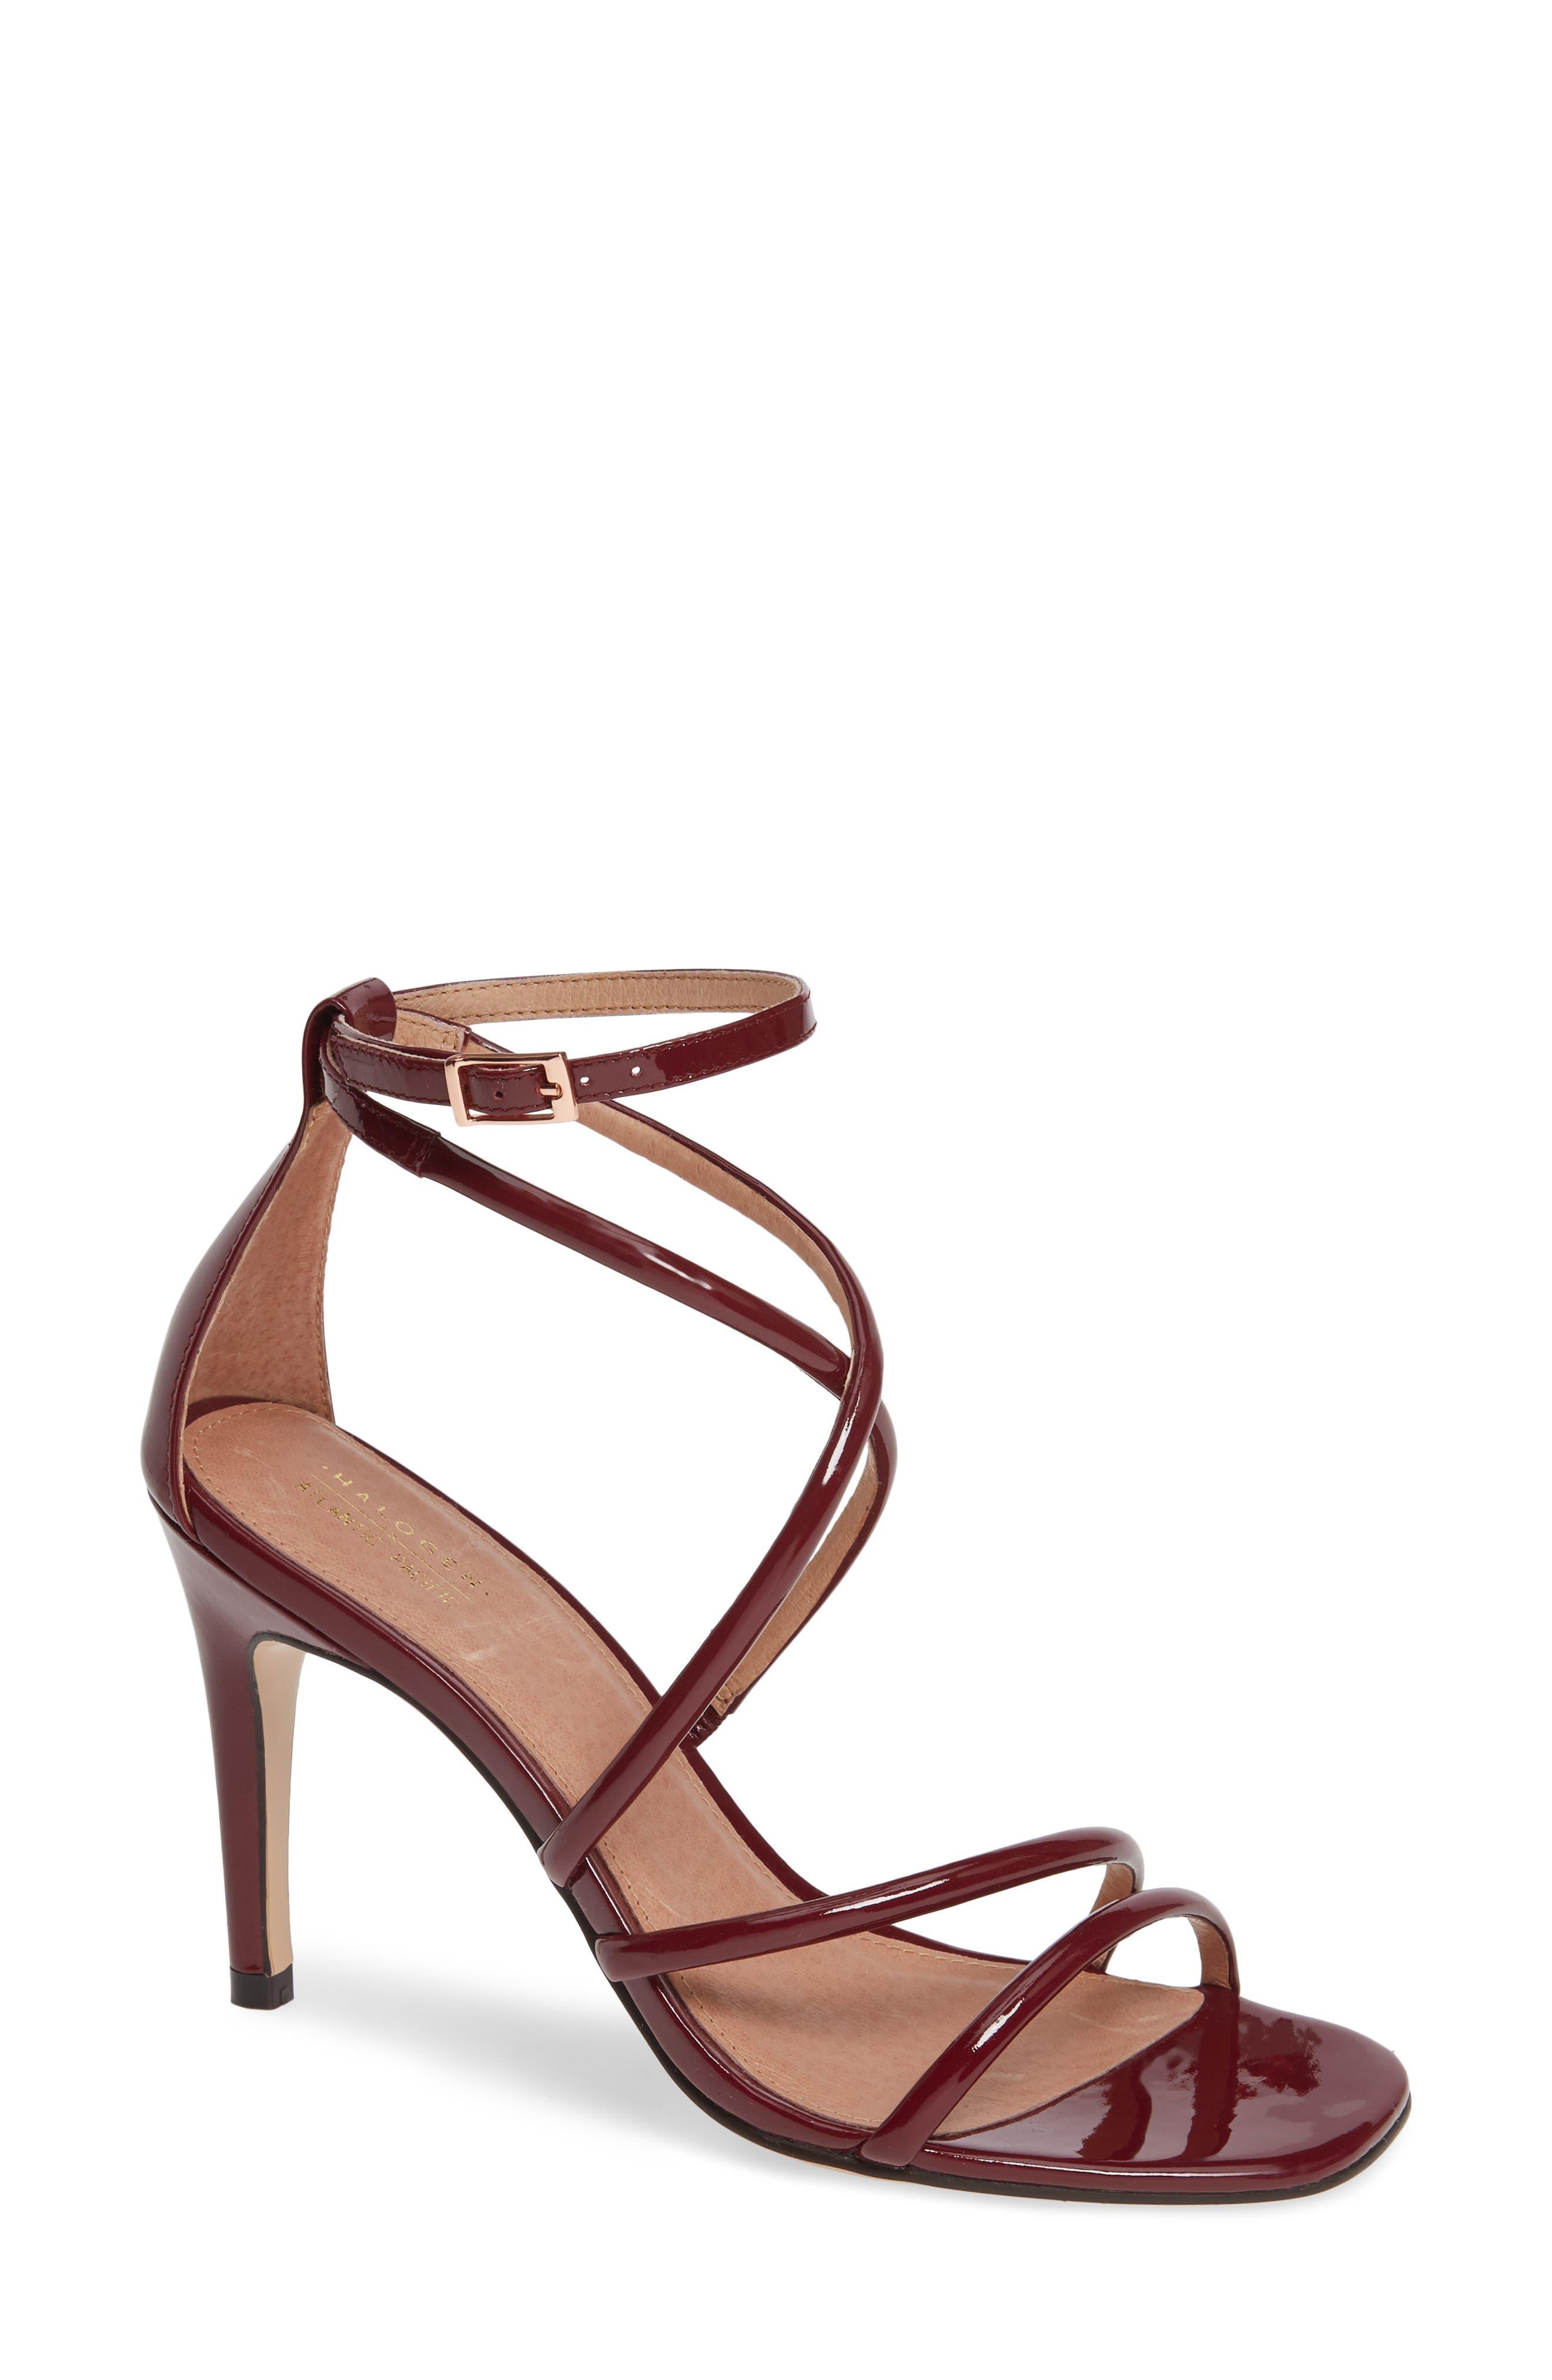 x Atlantic-Pacific Violetta Multi Strap Sandal,                         Main,                         color, MERLOT PATENT